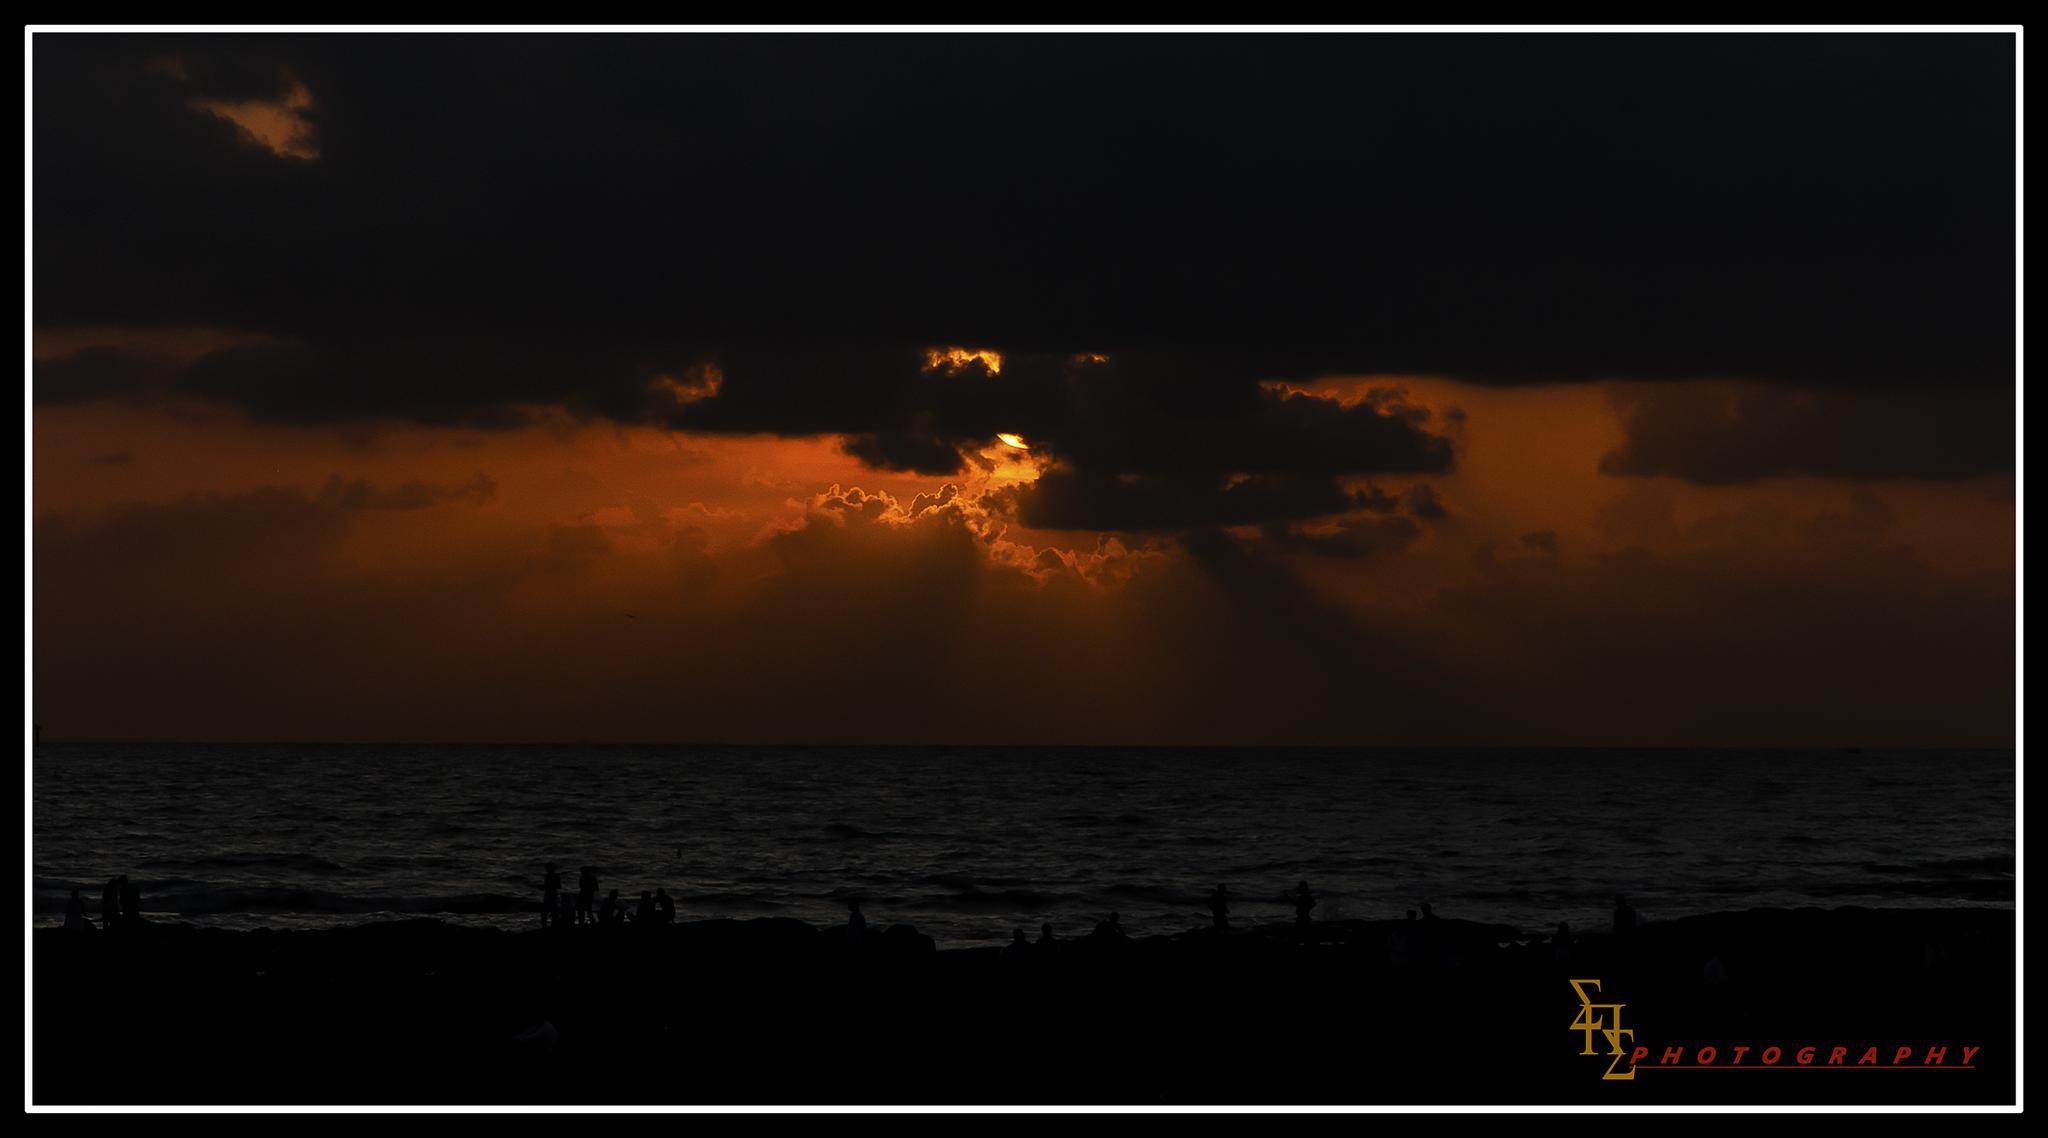 SUNSET by Swami Prem Sangeet ( Sanjay Jaiswal )